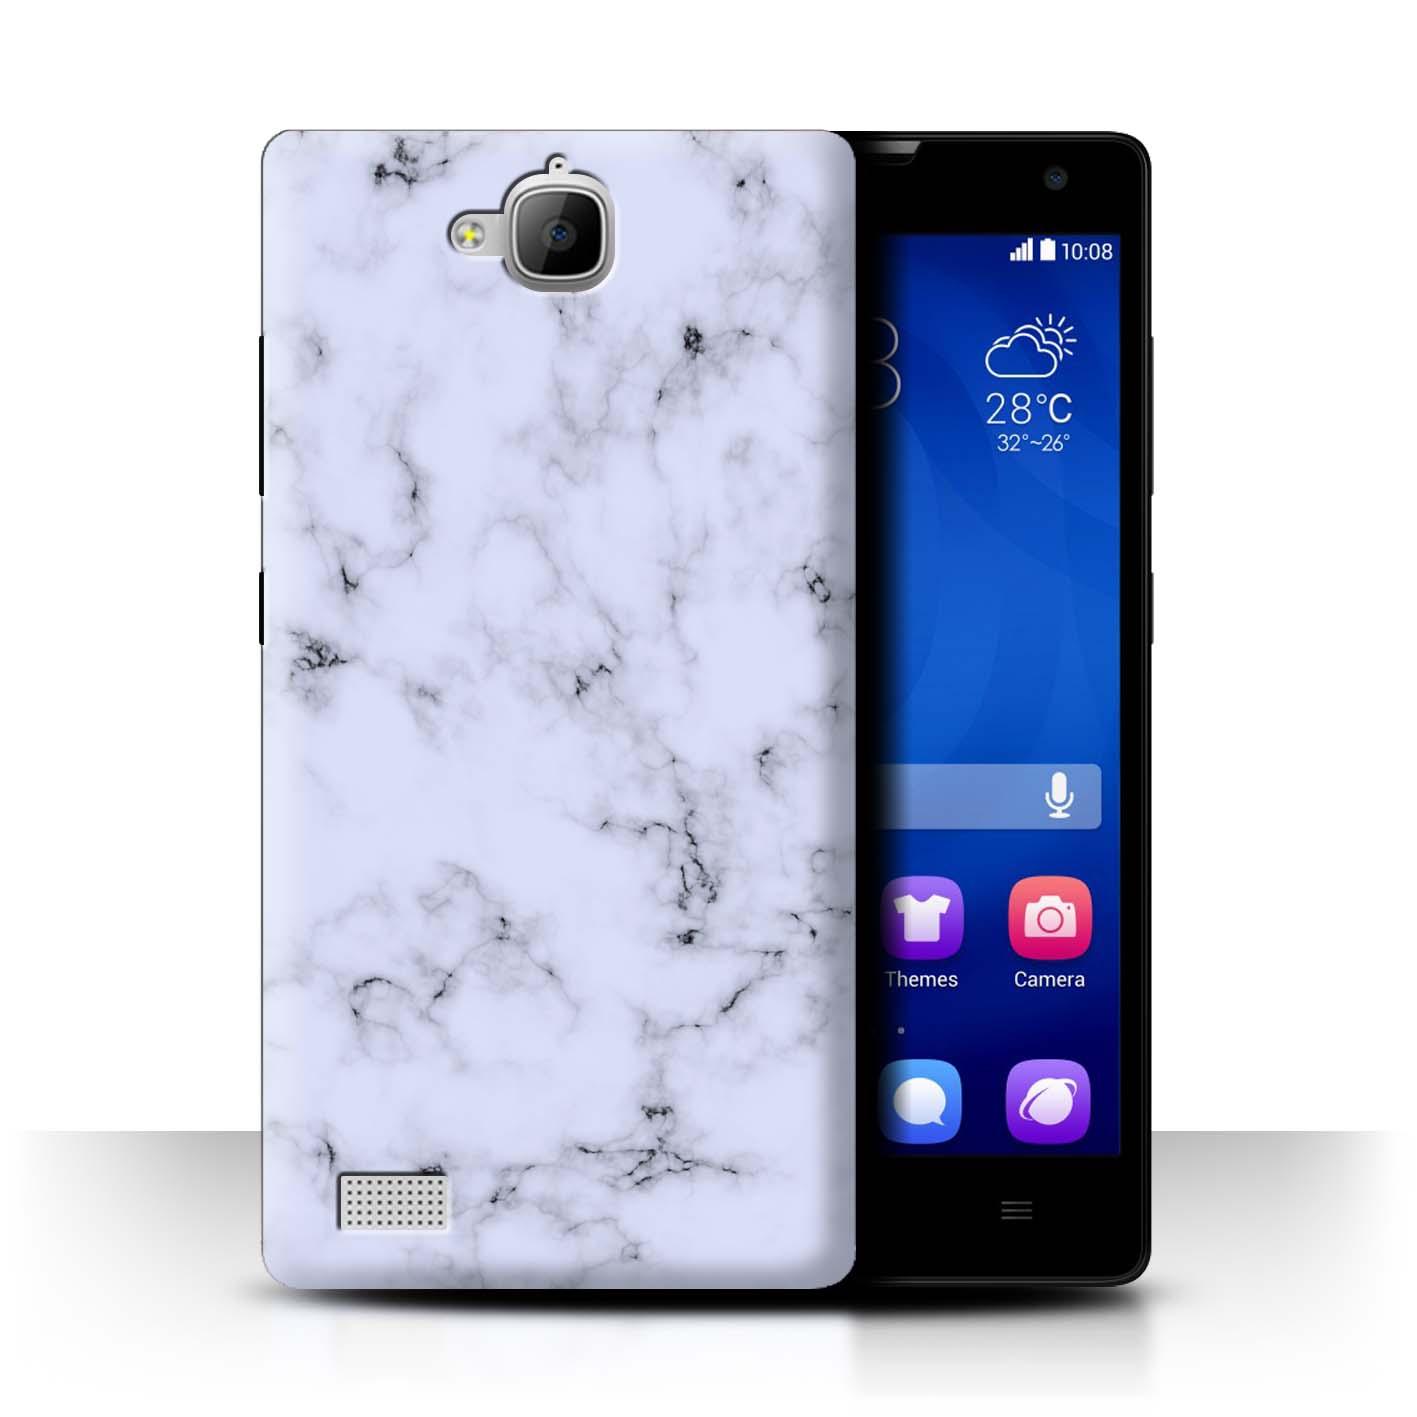 STUFF4-Funda-para-Telefono-para-Huawei-Honor-Smartphone-Marmol-Rock